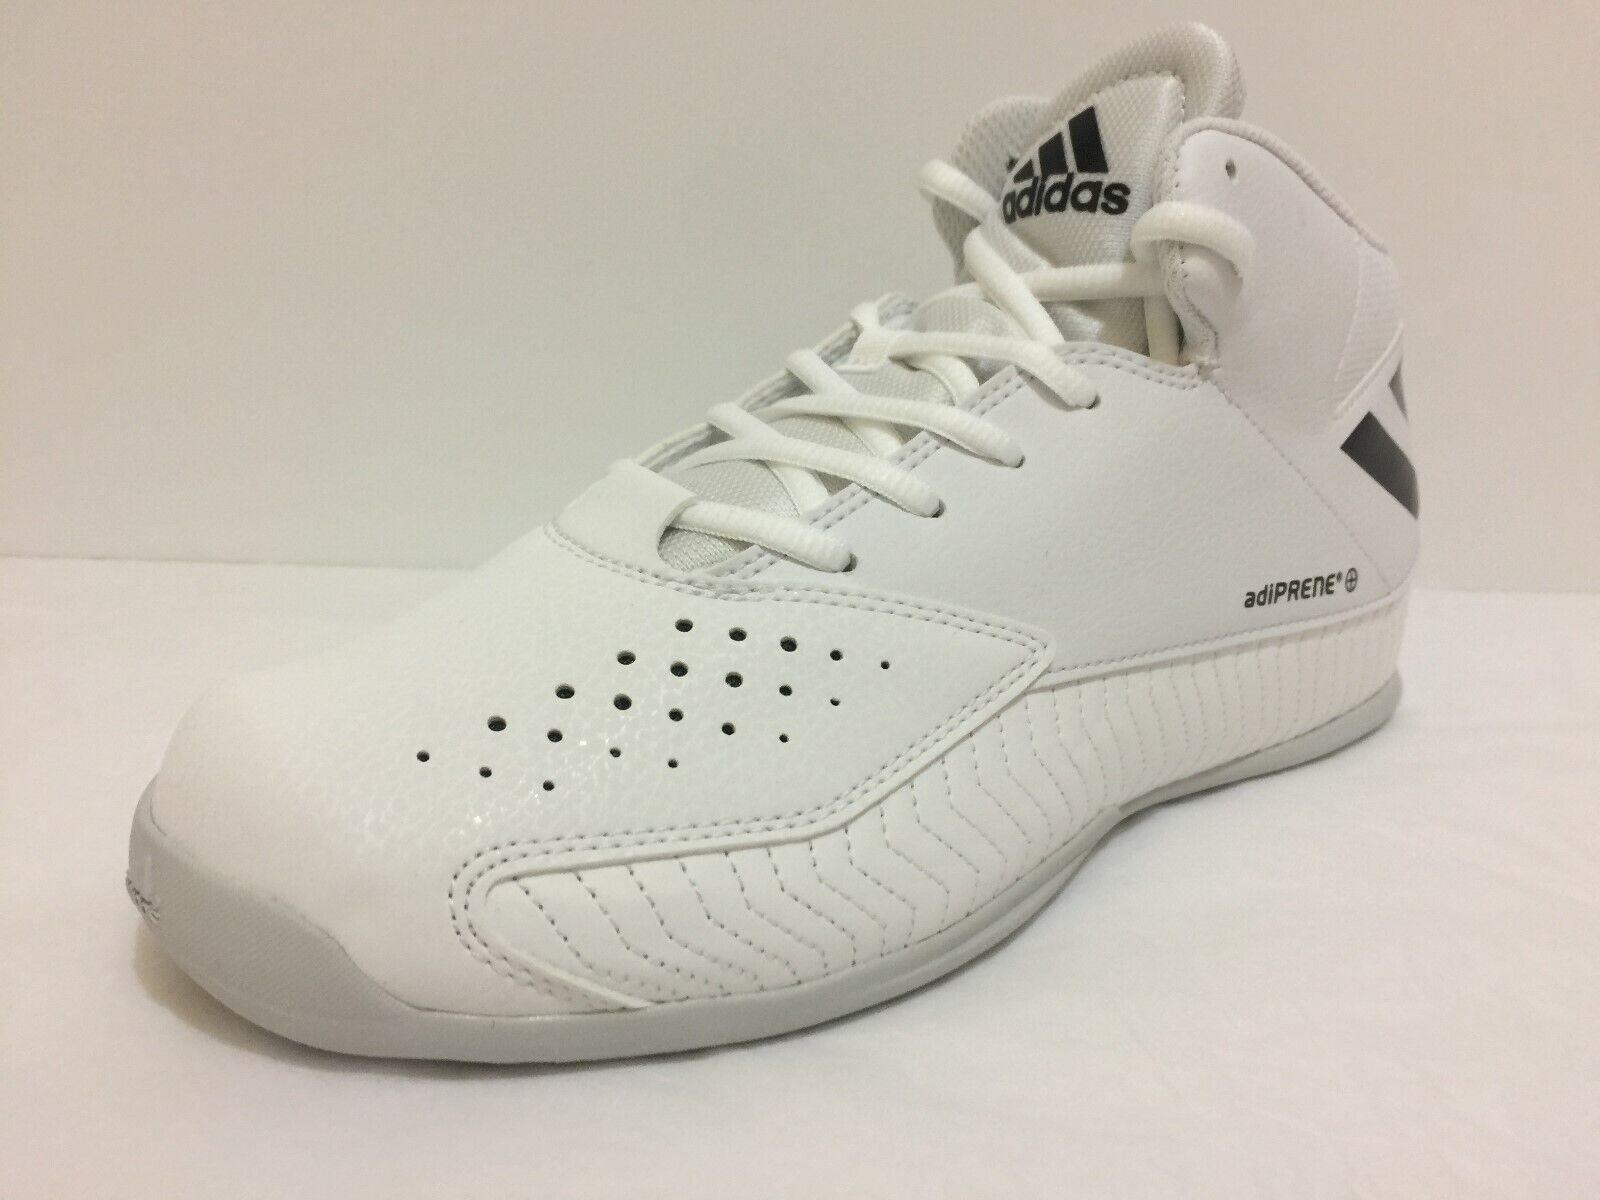 Restricción desaparecer Que agradable  adidas Shoes NXT Lvl SPD V Bw0624 Basketball White/ Black Size 13 ...